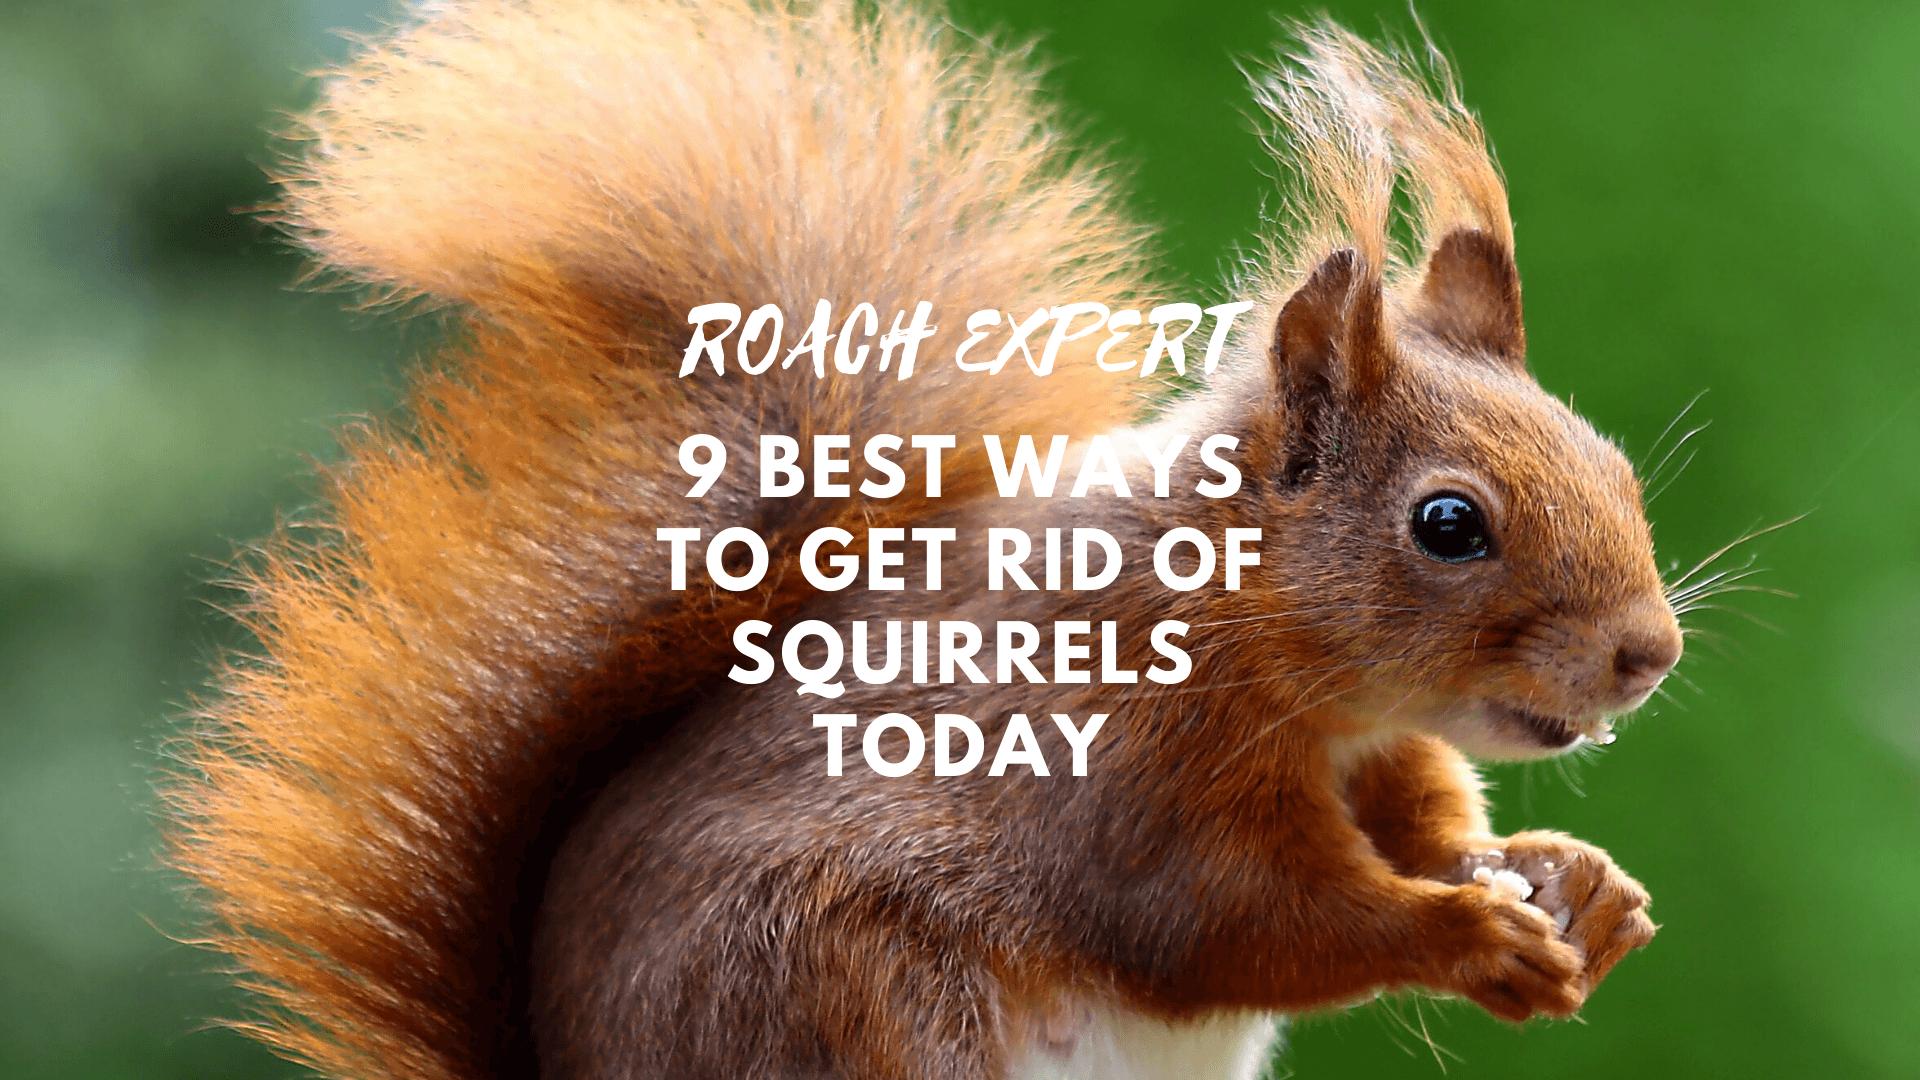 9 Best Ways to Get Rid of Squirrels Today